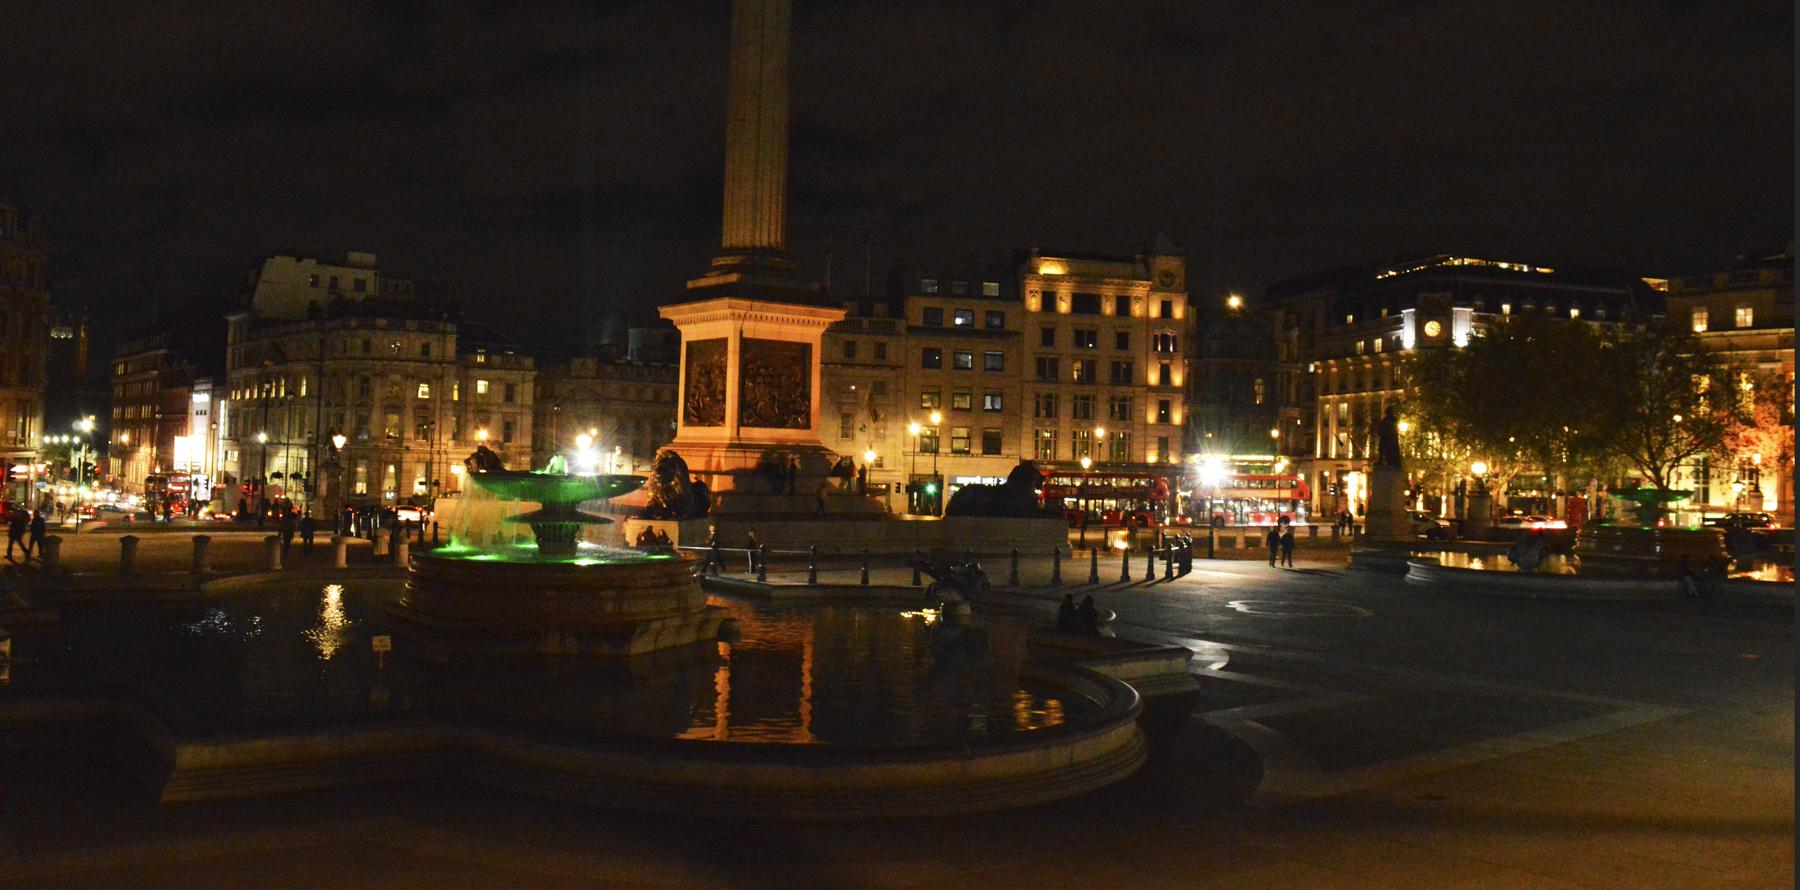 164 Trafalgar Square. 25.04.2019